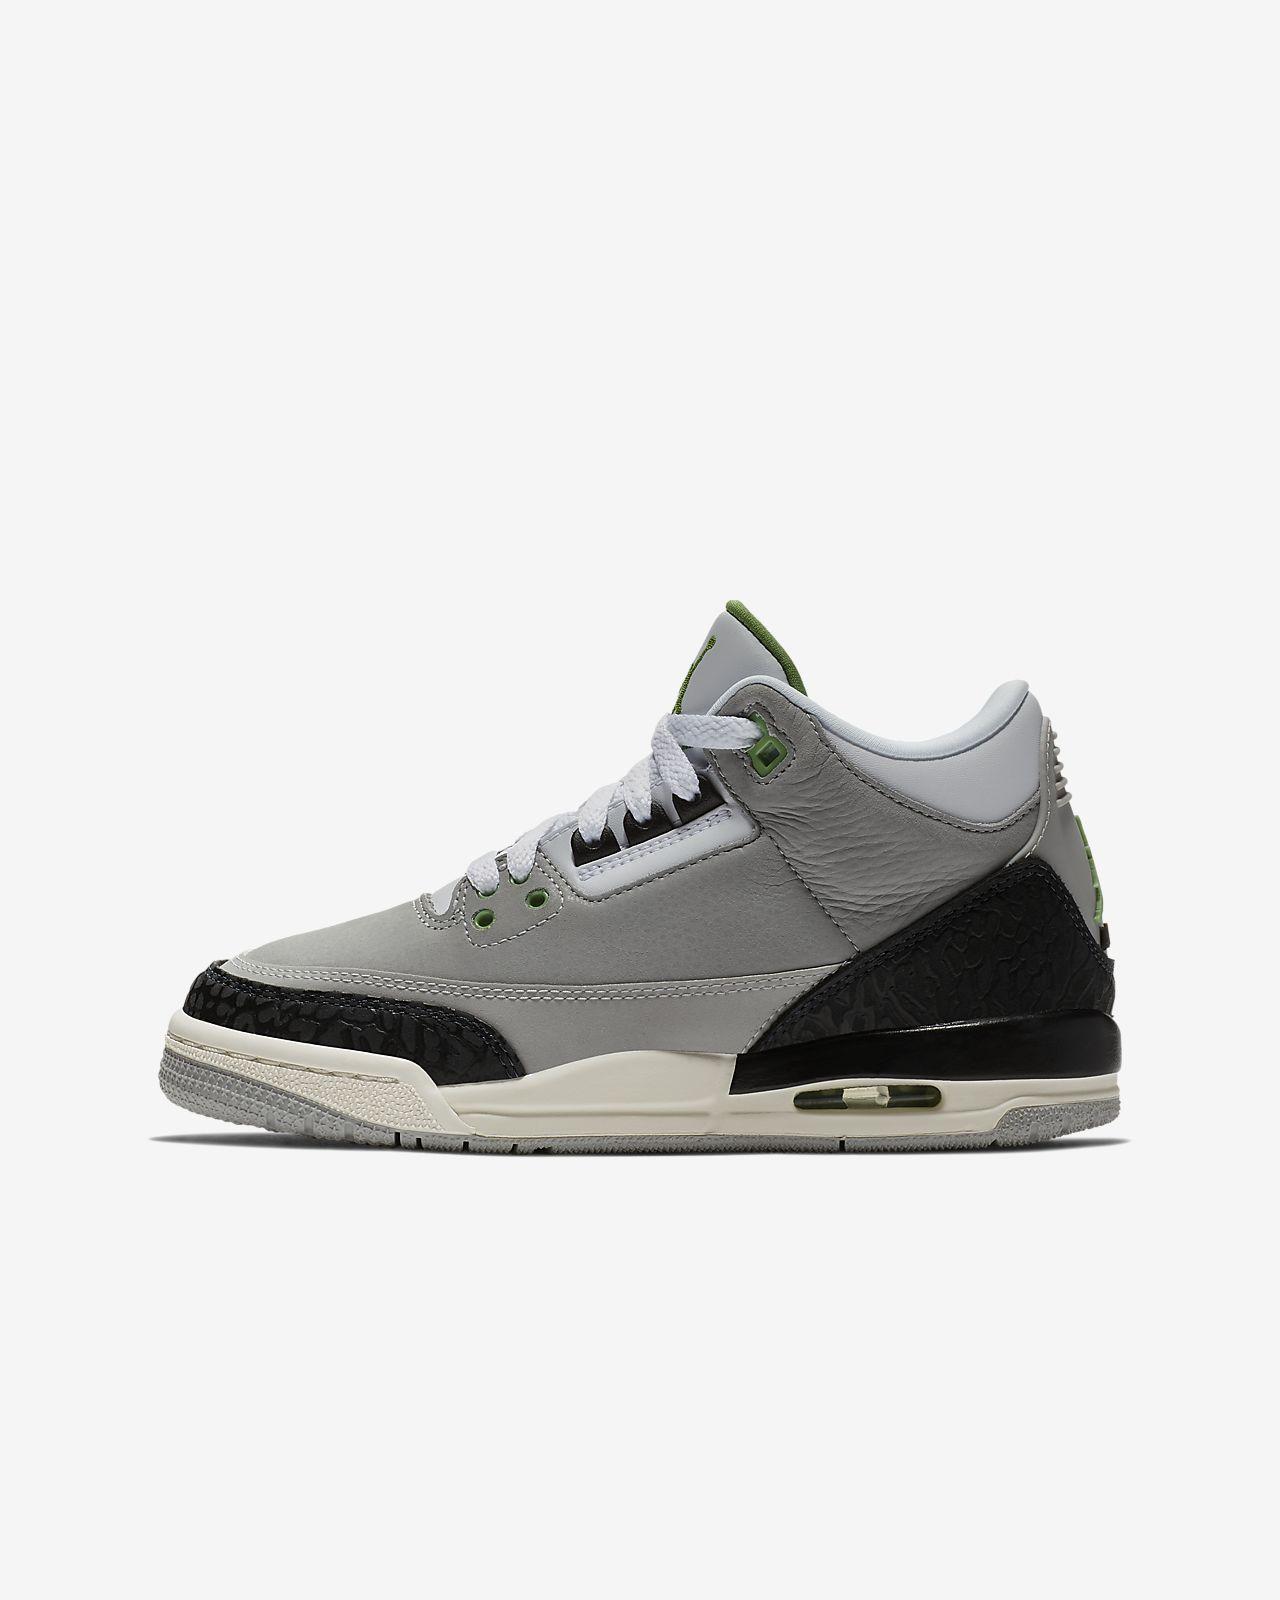 b7dd12d68c08ac ... france air jordan 3 retro kids shoe 9fd26 f03a2